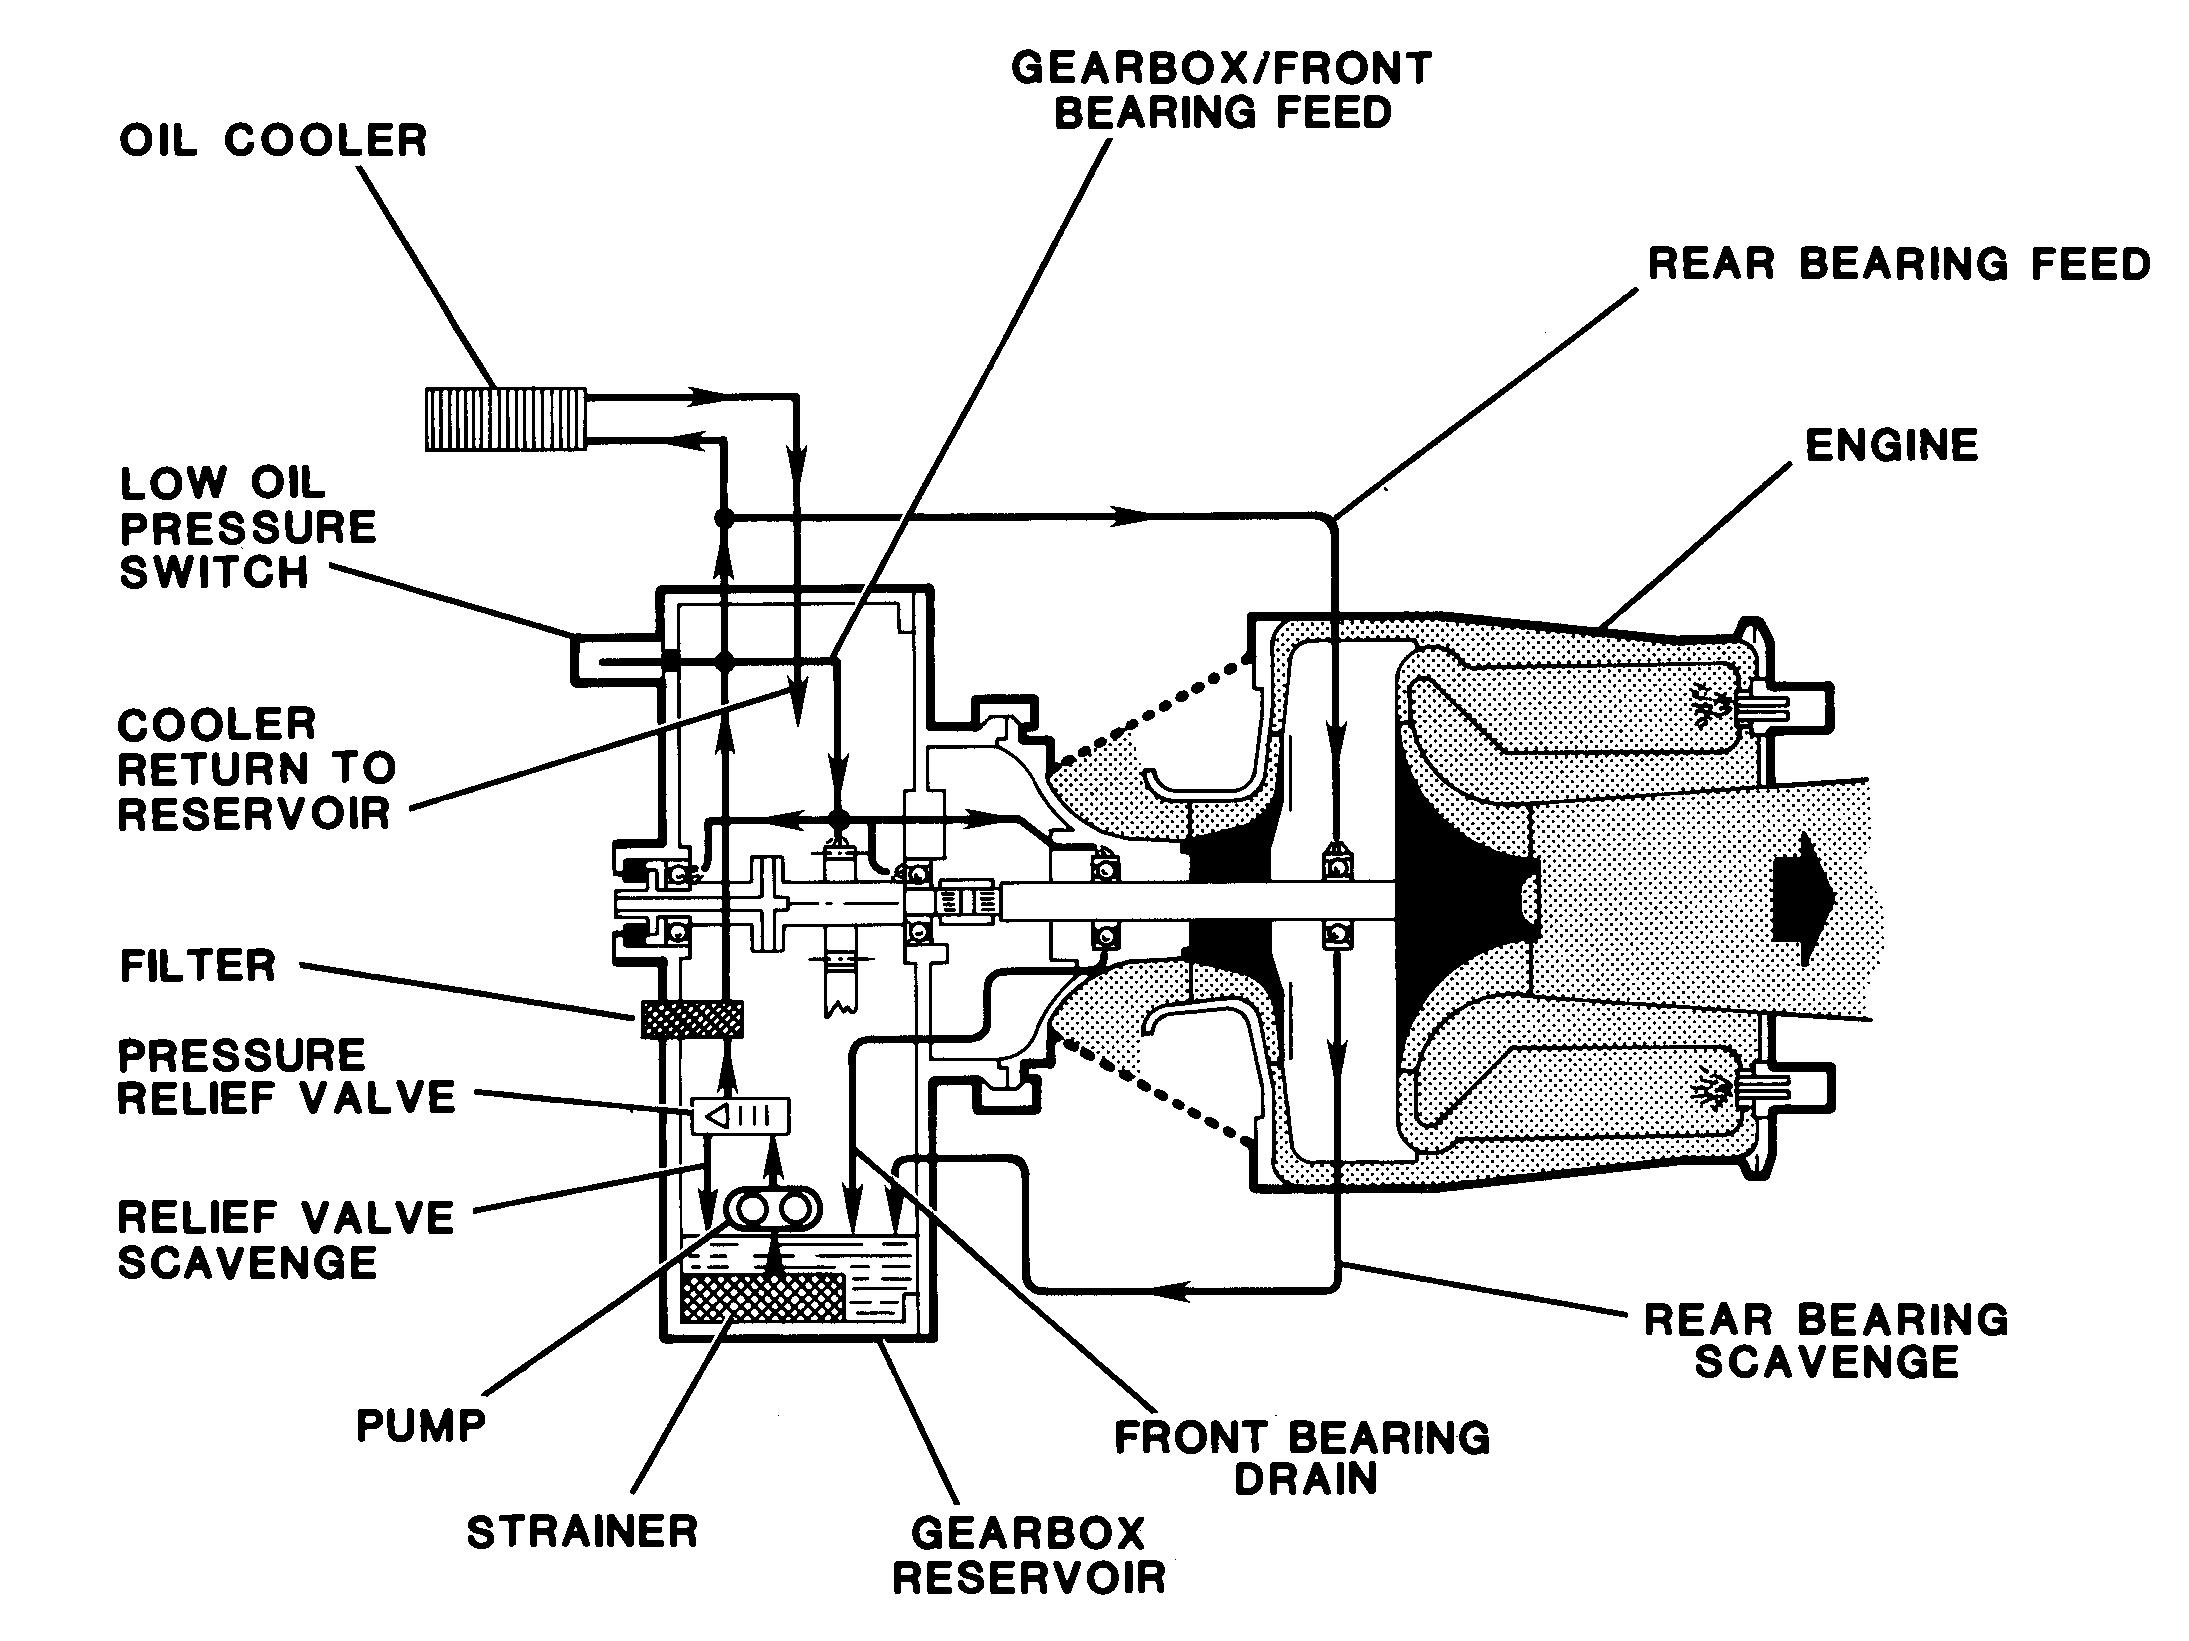 lube oil system diagram simple alternator wiring enginursday yeah i found it on ebay news sparkfun